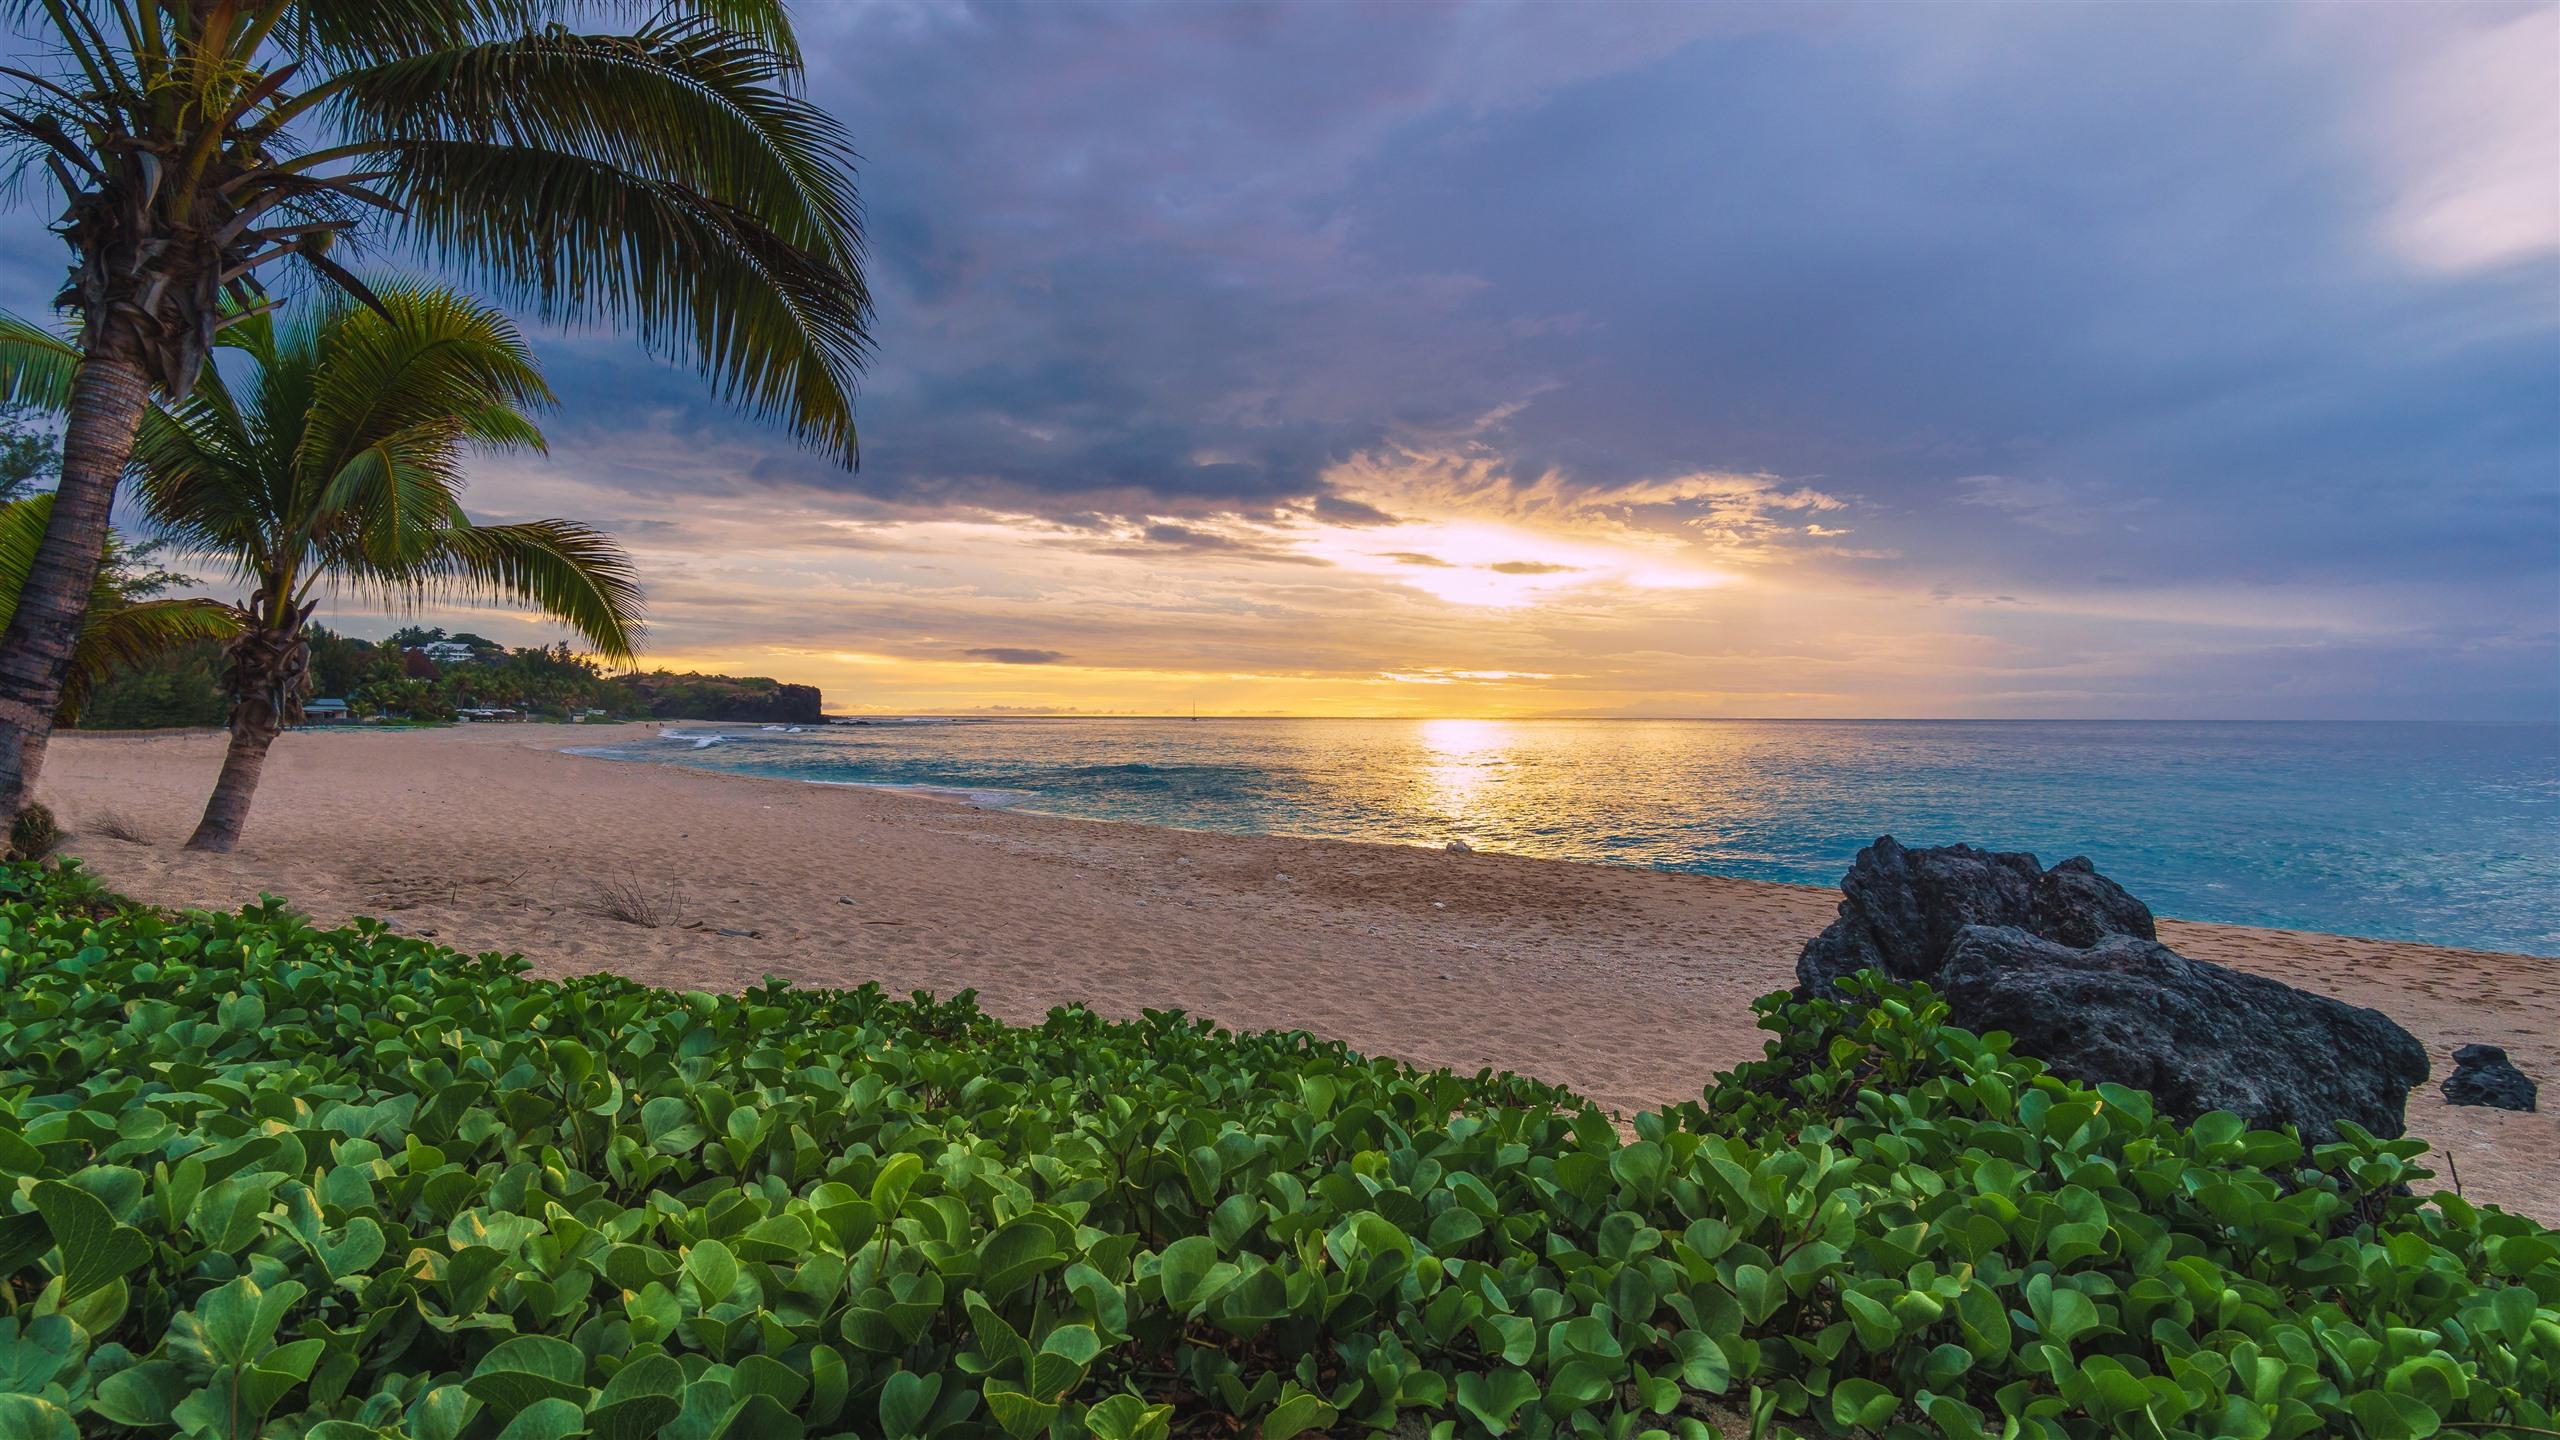 Wallpaper Caribbean Sea Beach Sunset Palm Trees Hd 5k: 배경 화면 프랑스, 인도양, 바다, 해변, 야자수, 식물, 일몰 5120x2880 UHD 5K 그림, 이미지